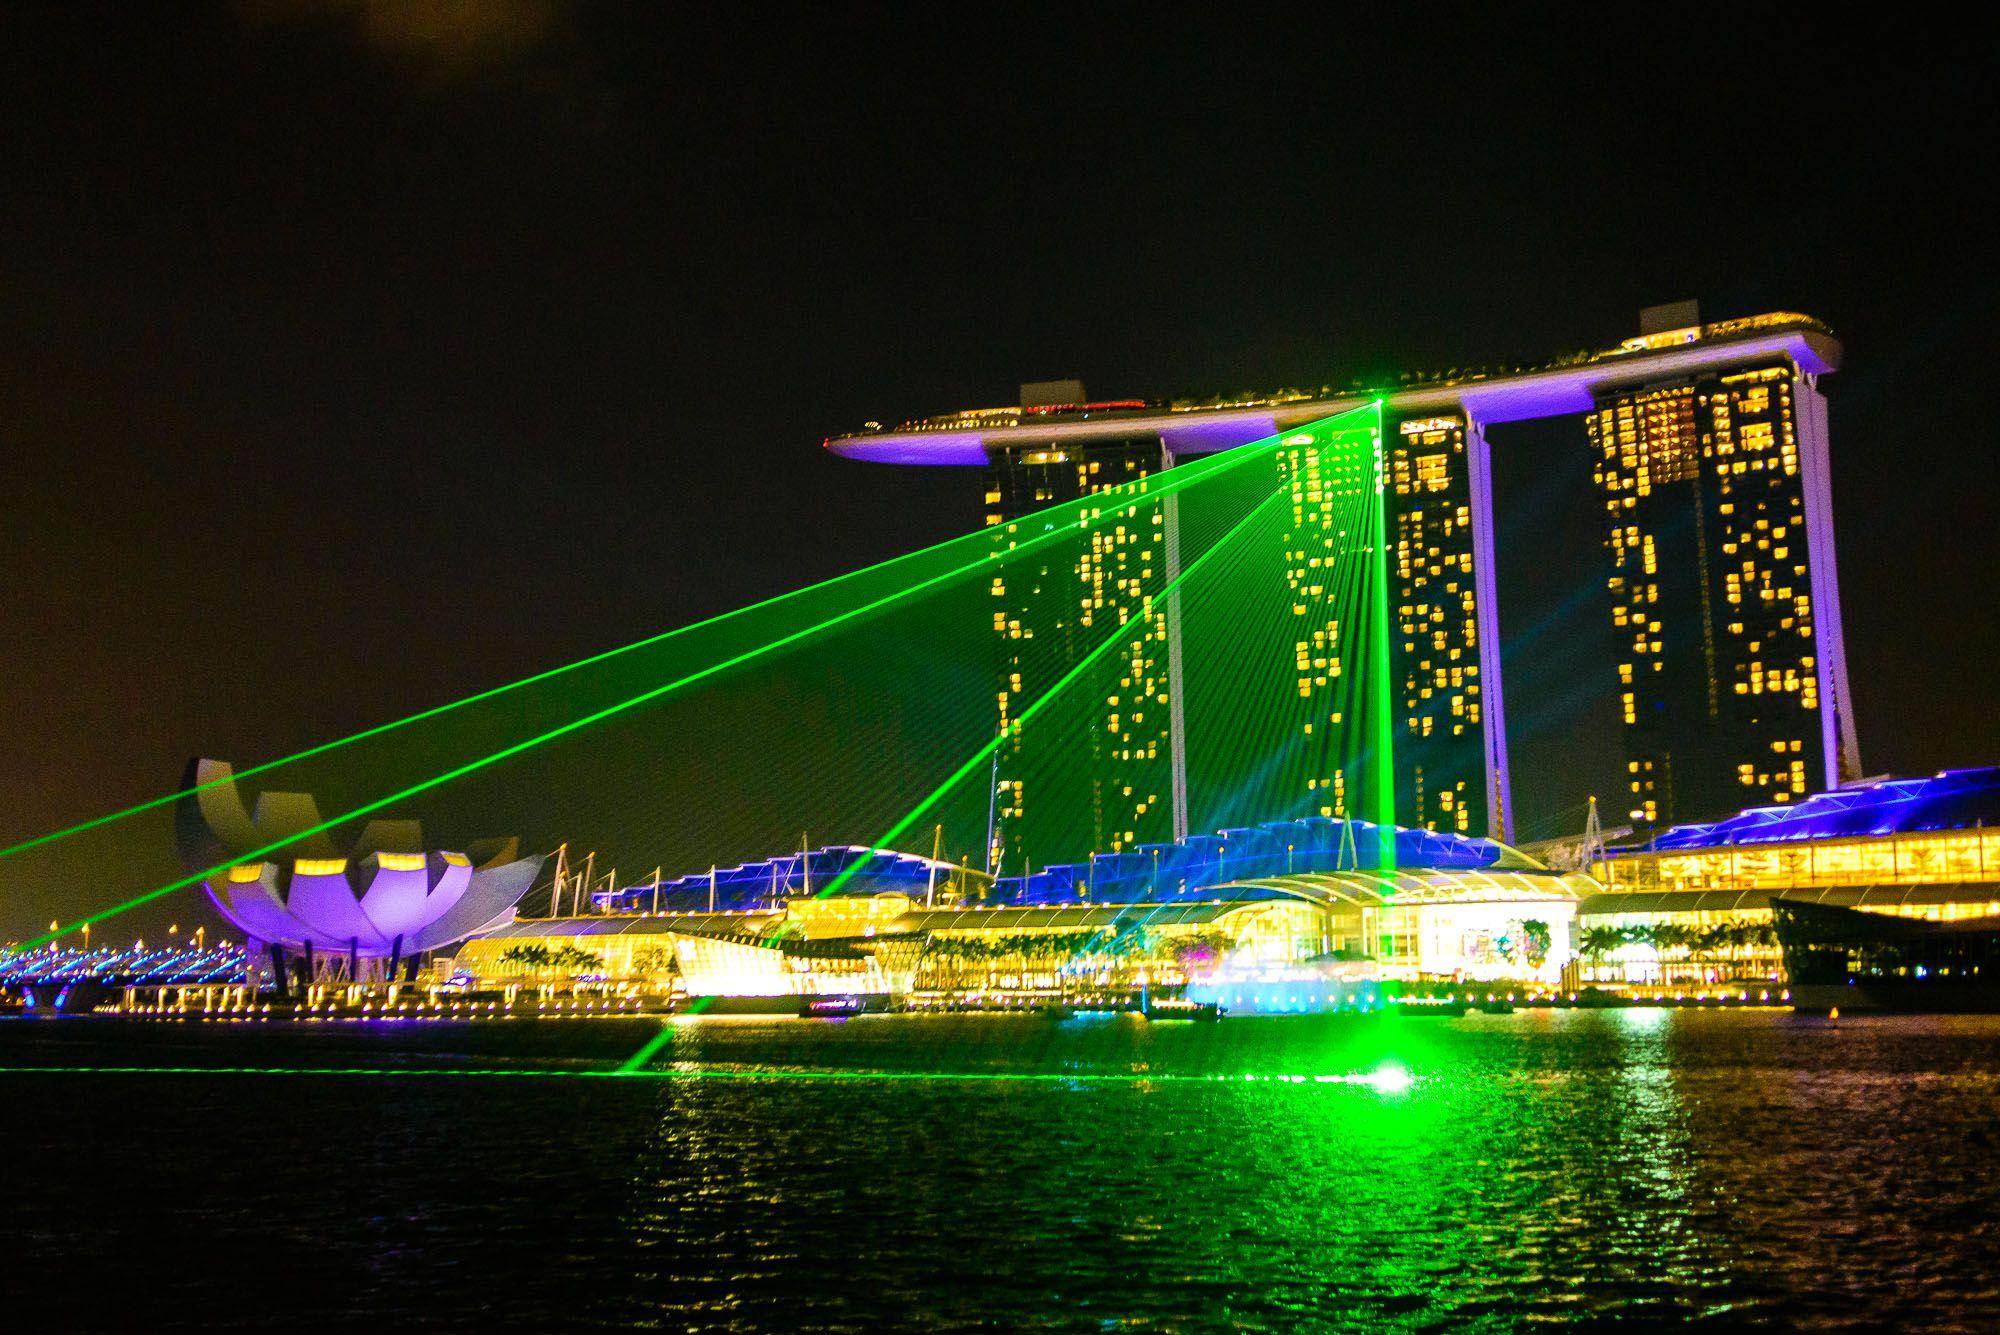 marina bay sands skyscraper in singapore thousand wonders